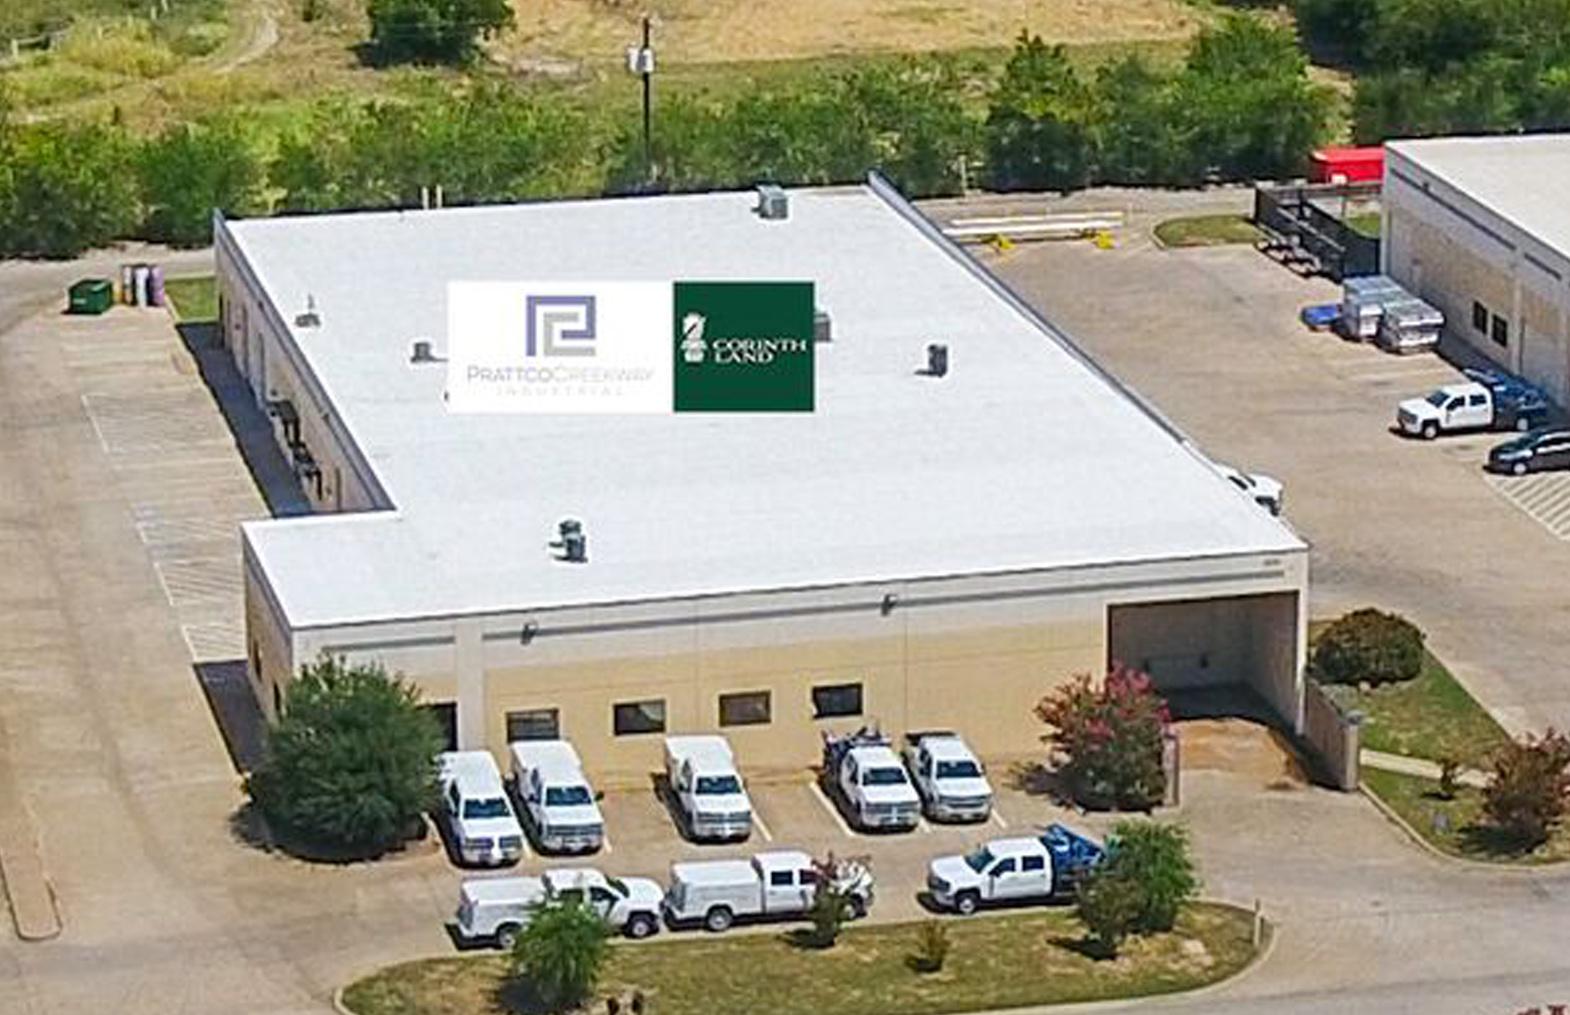 6750 Corporate parkway